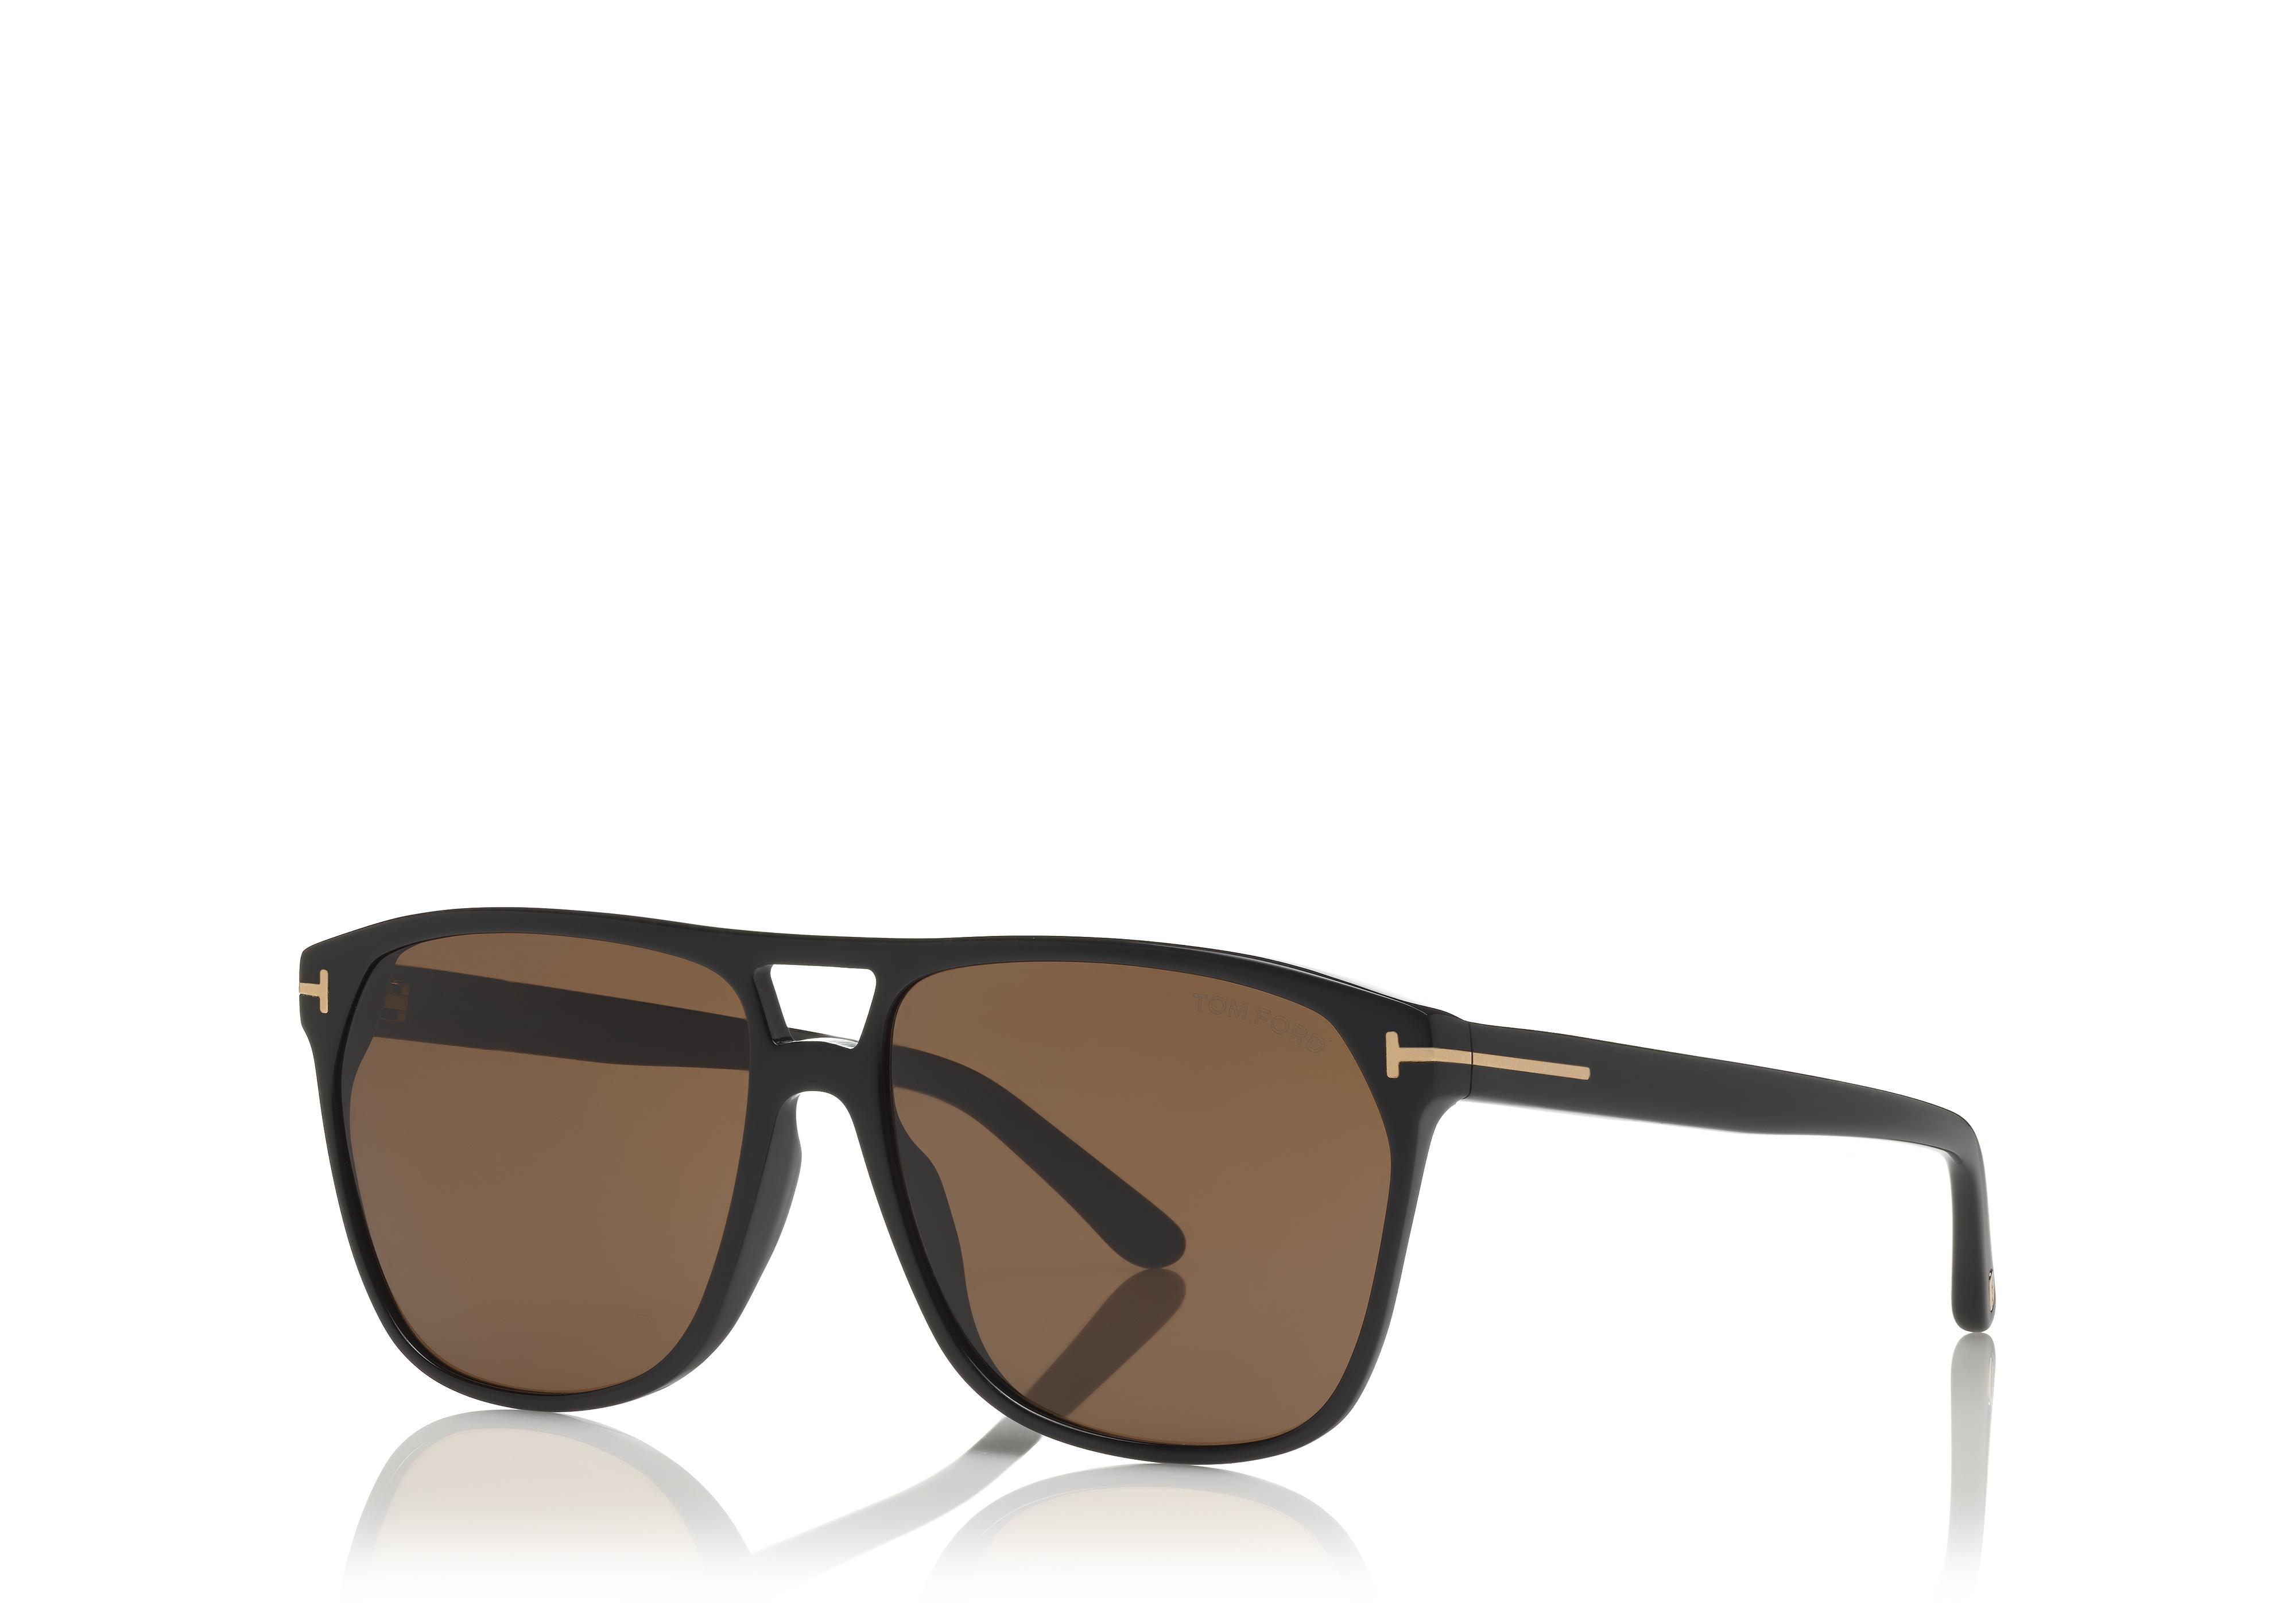 Tom Ford TF 679 FT0679  Shelton shiny red havana smoke polarized 54D Sunglasses